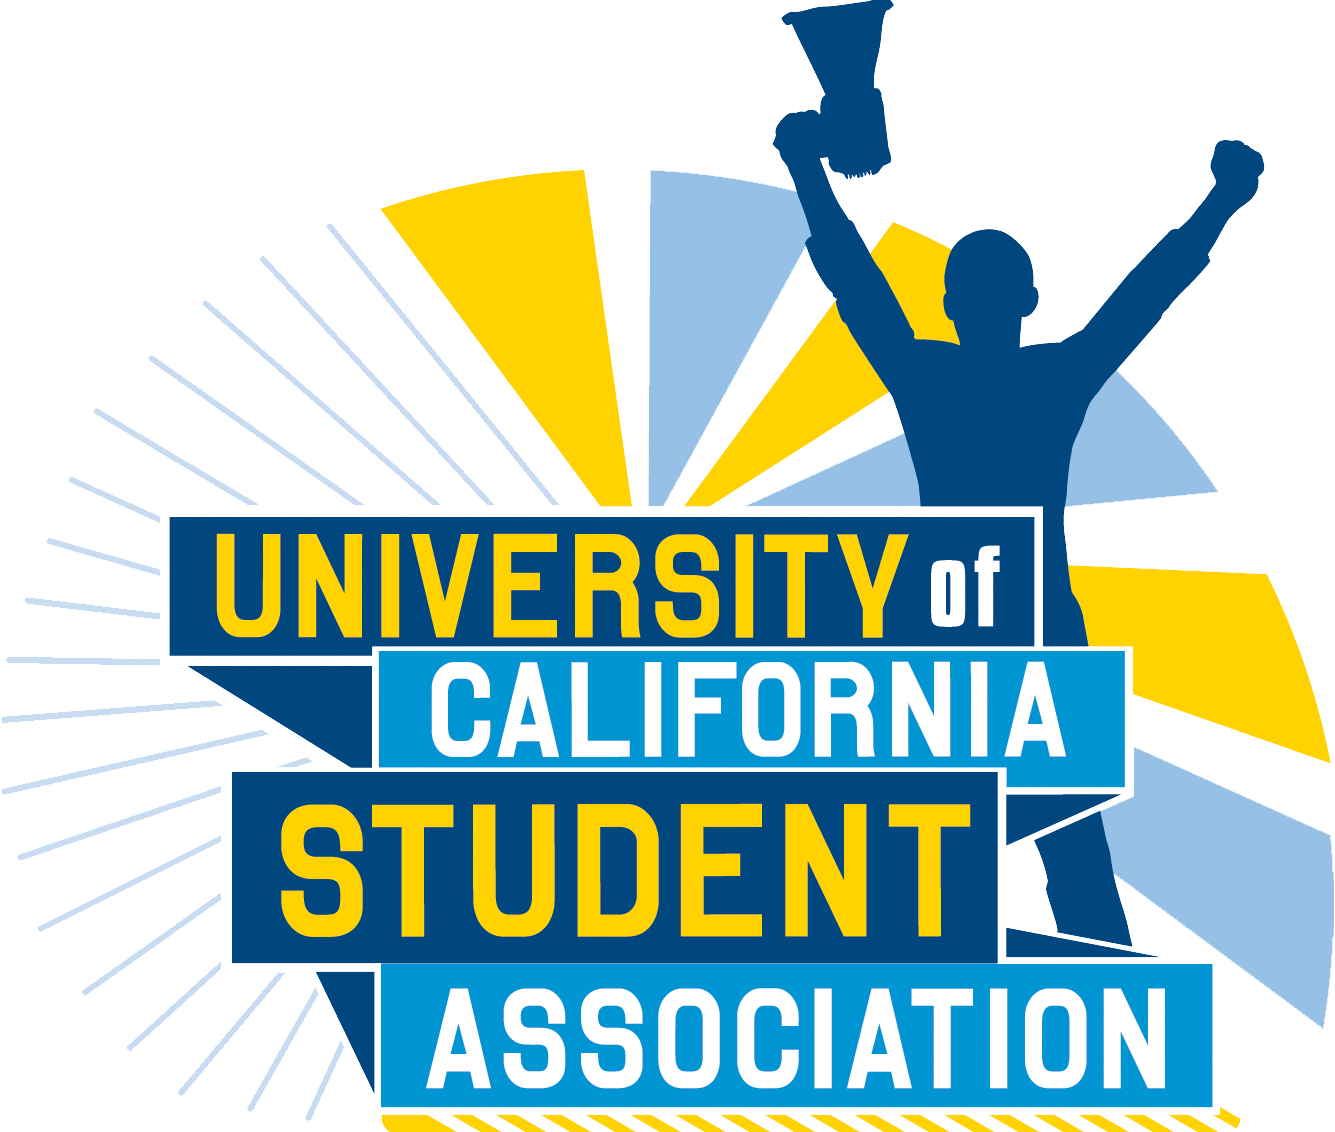 University of California Student Association